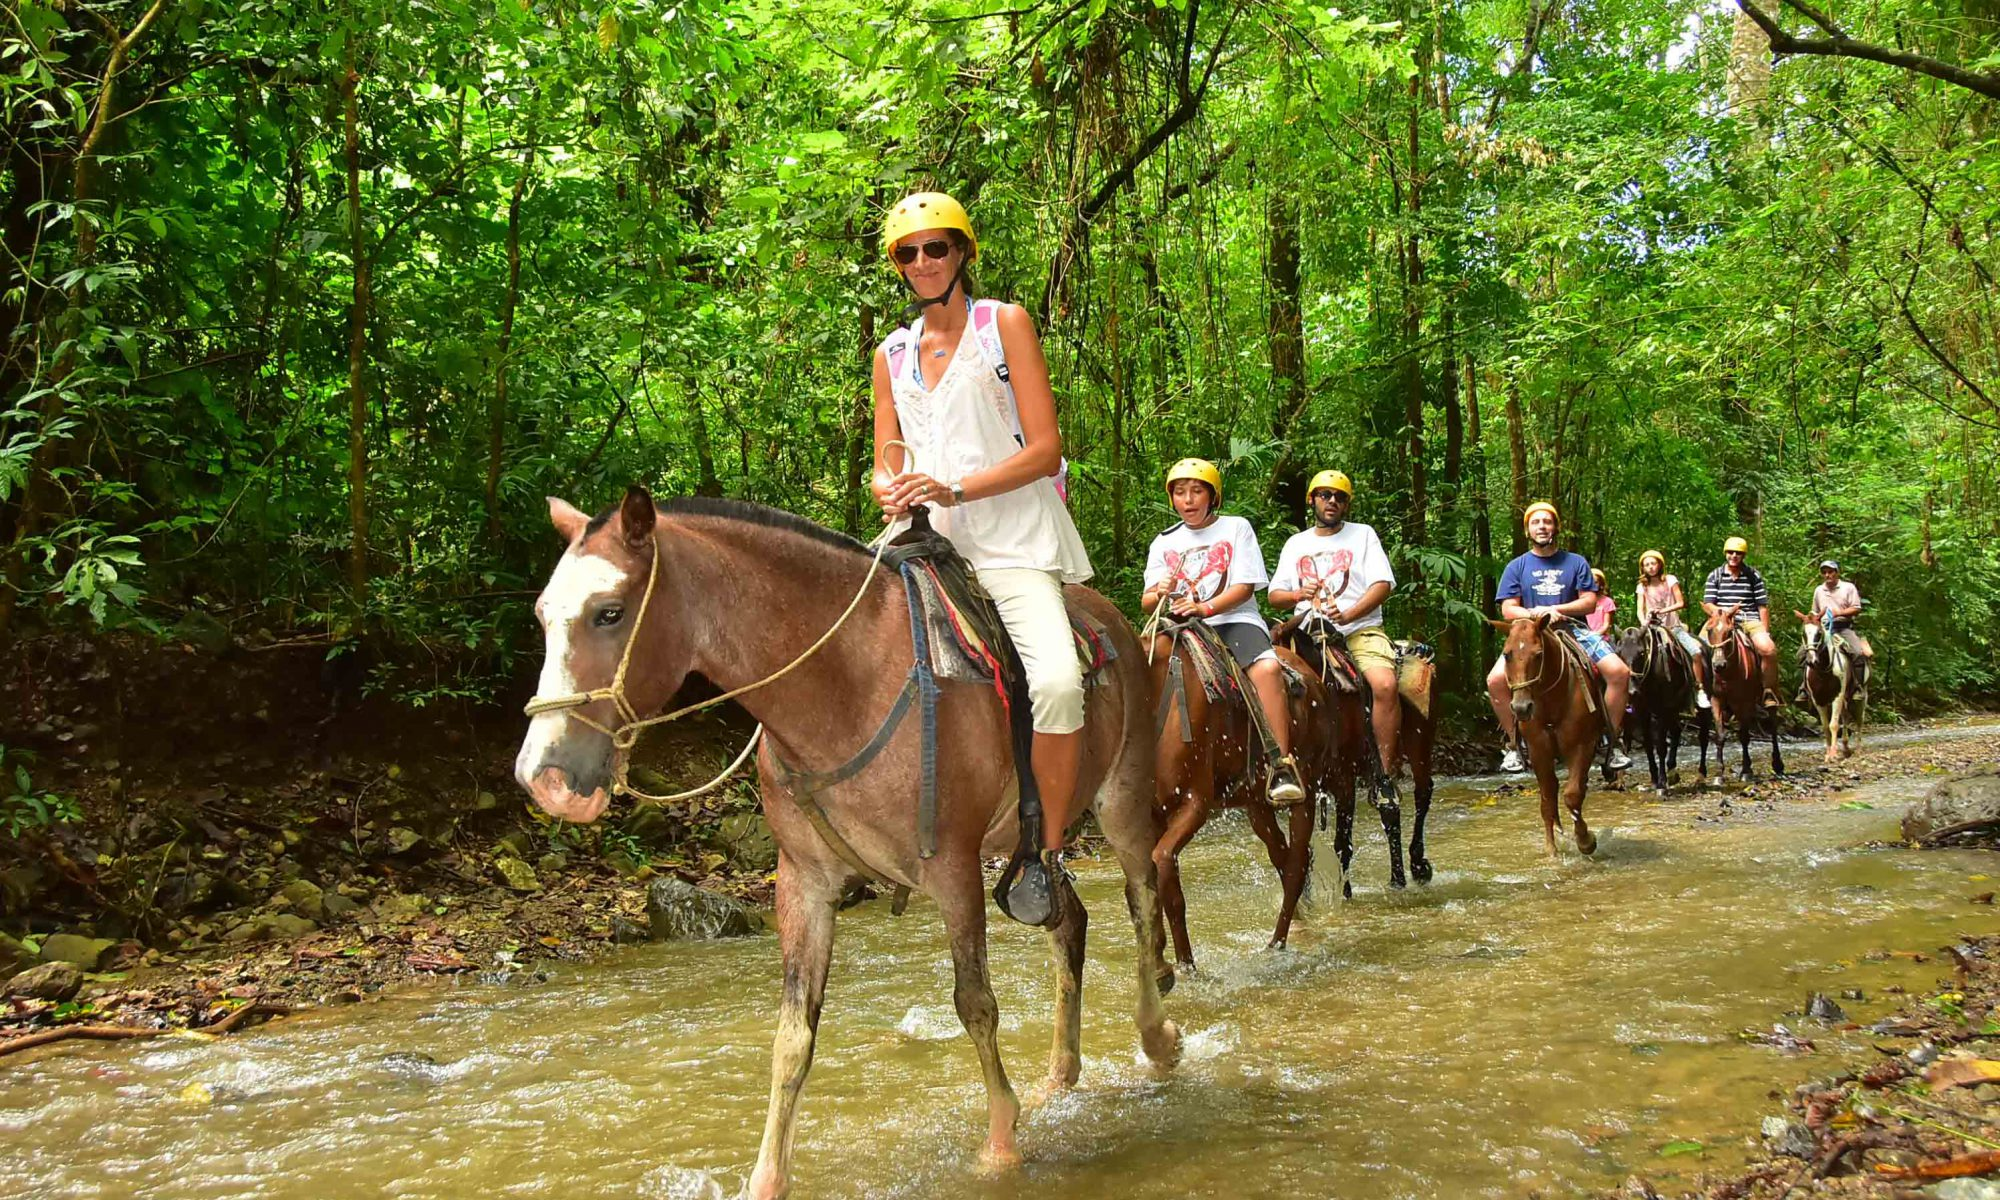 Horseback Riding Fun - Long Island Adventures